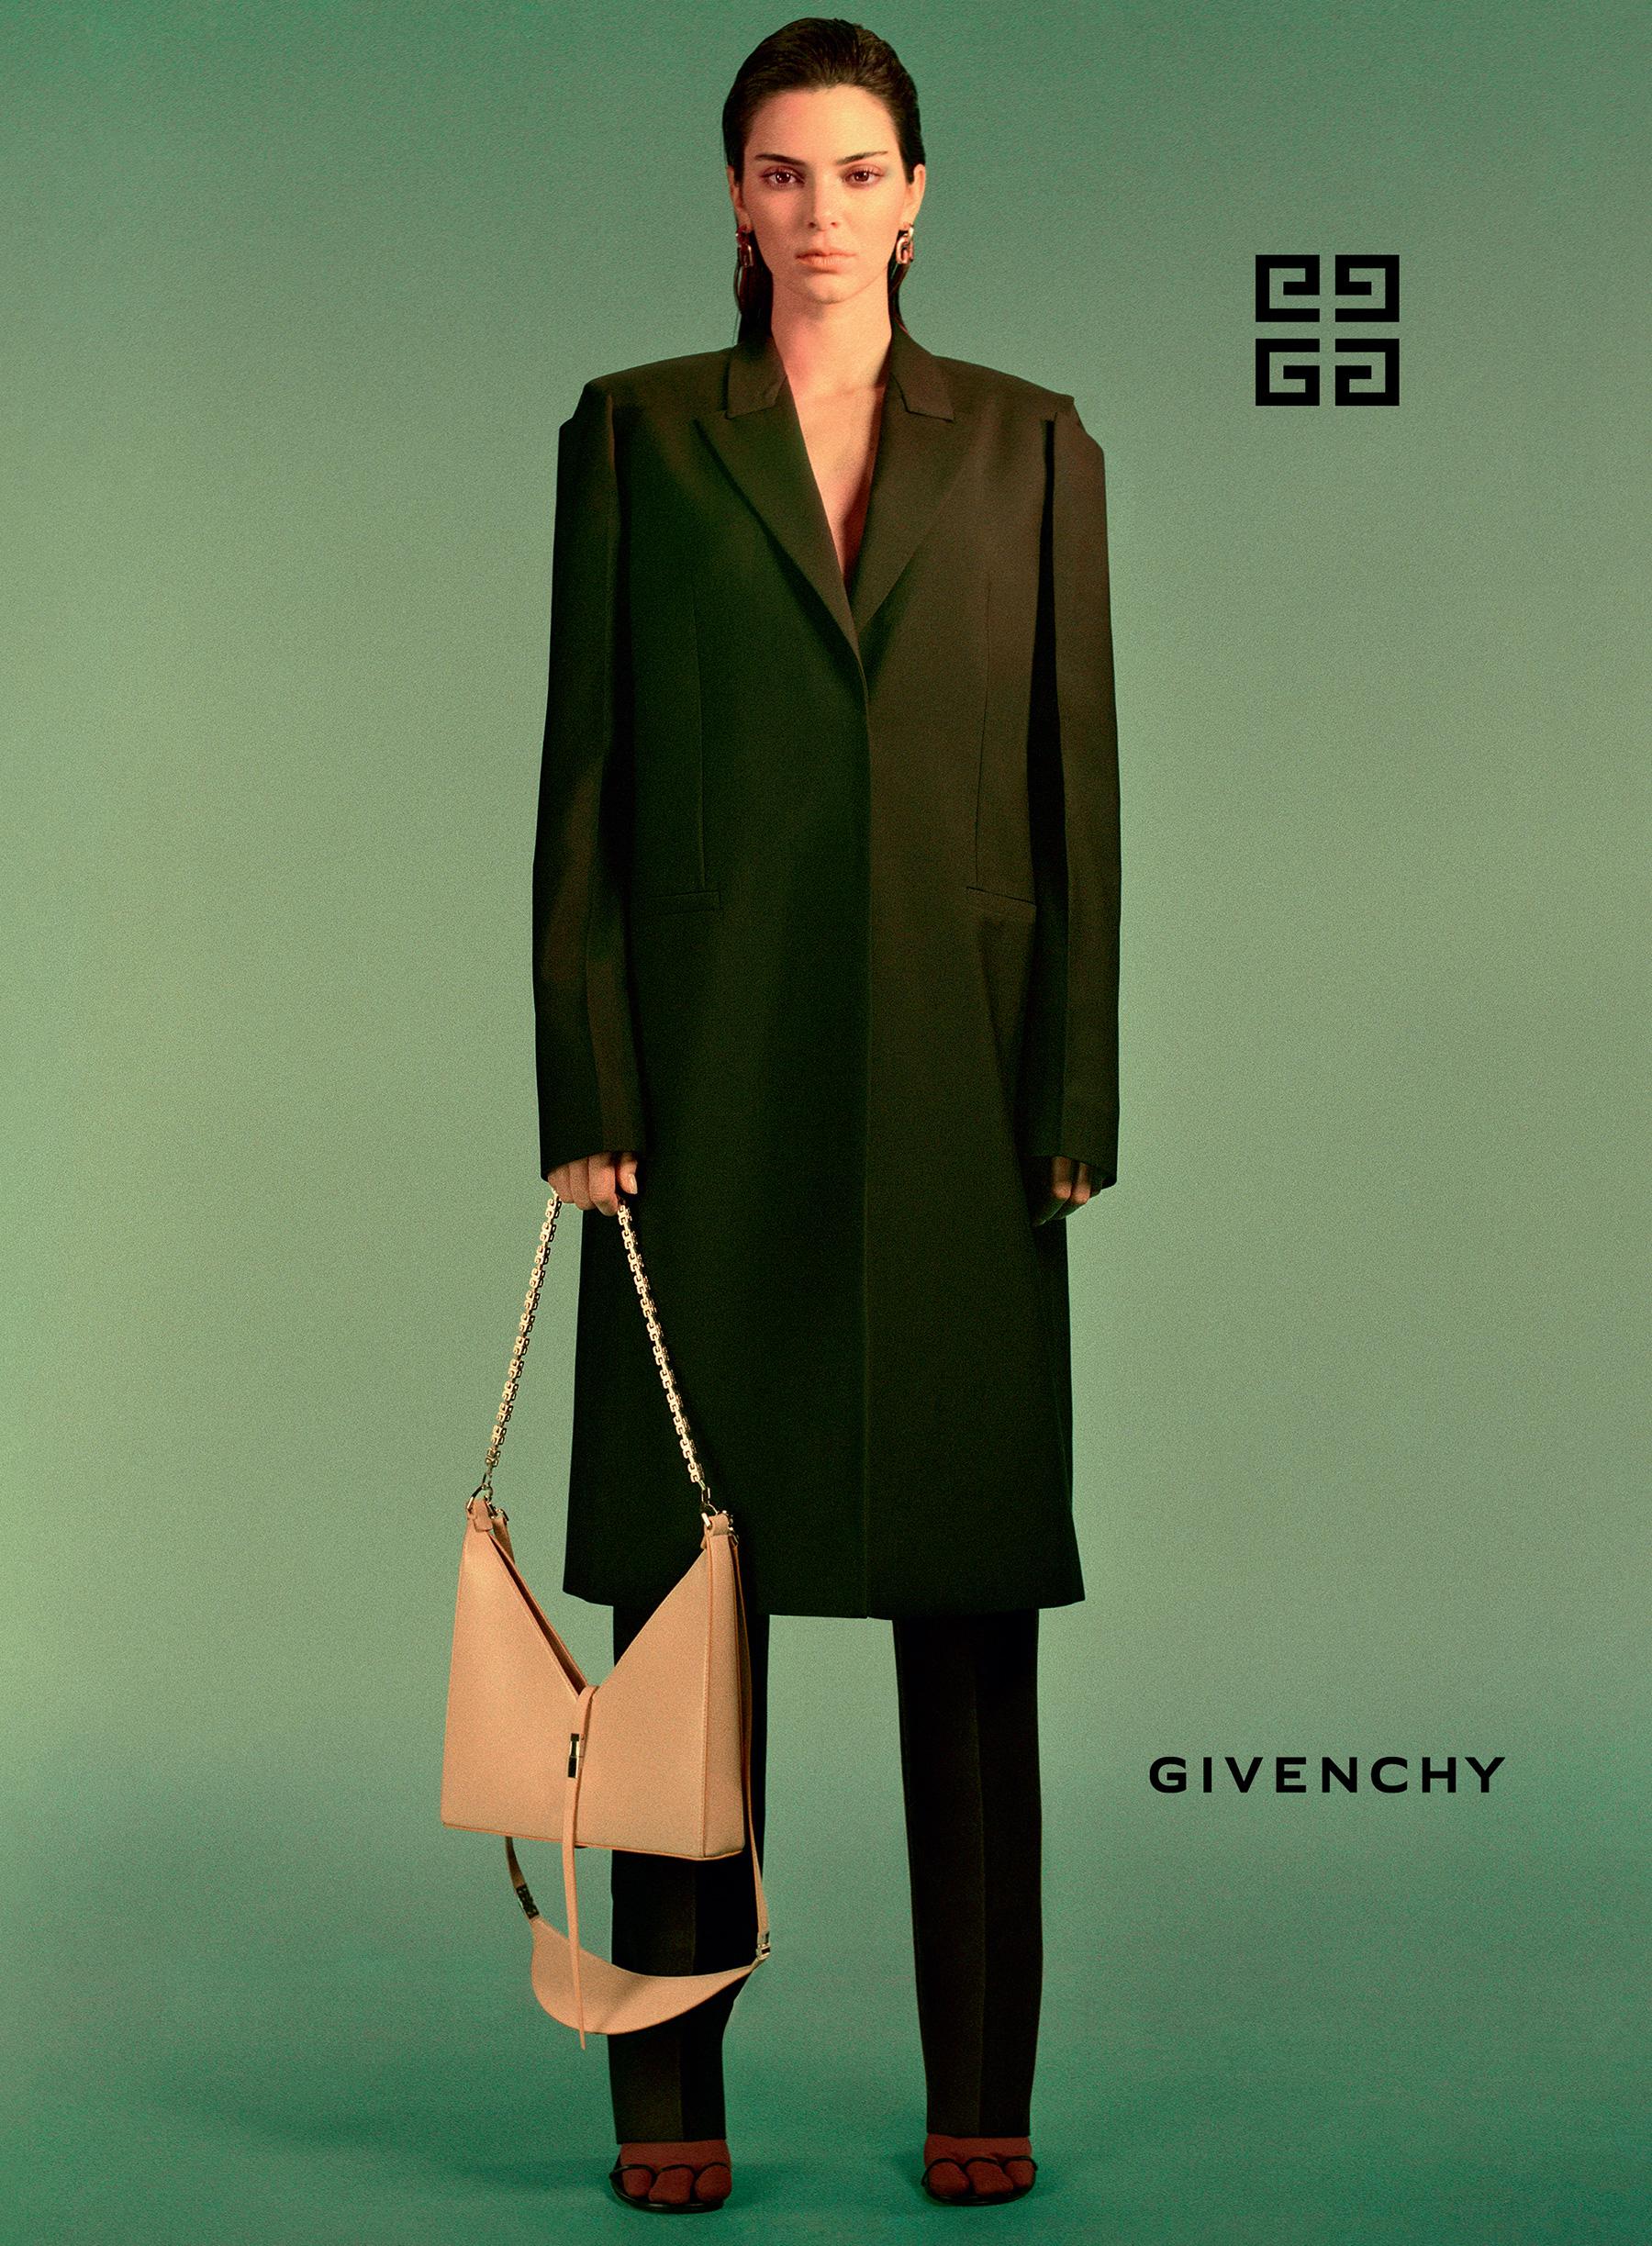 Givenchy Spring 2021 Ad Campaign Photos